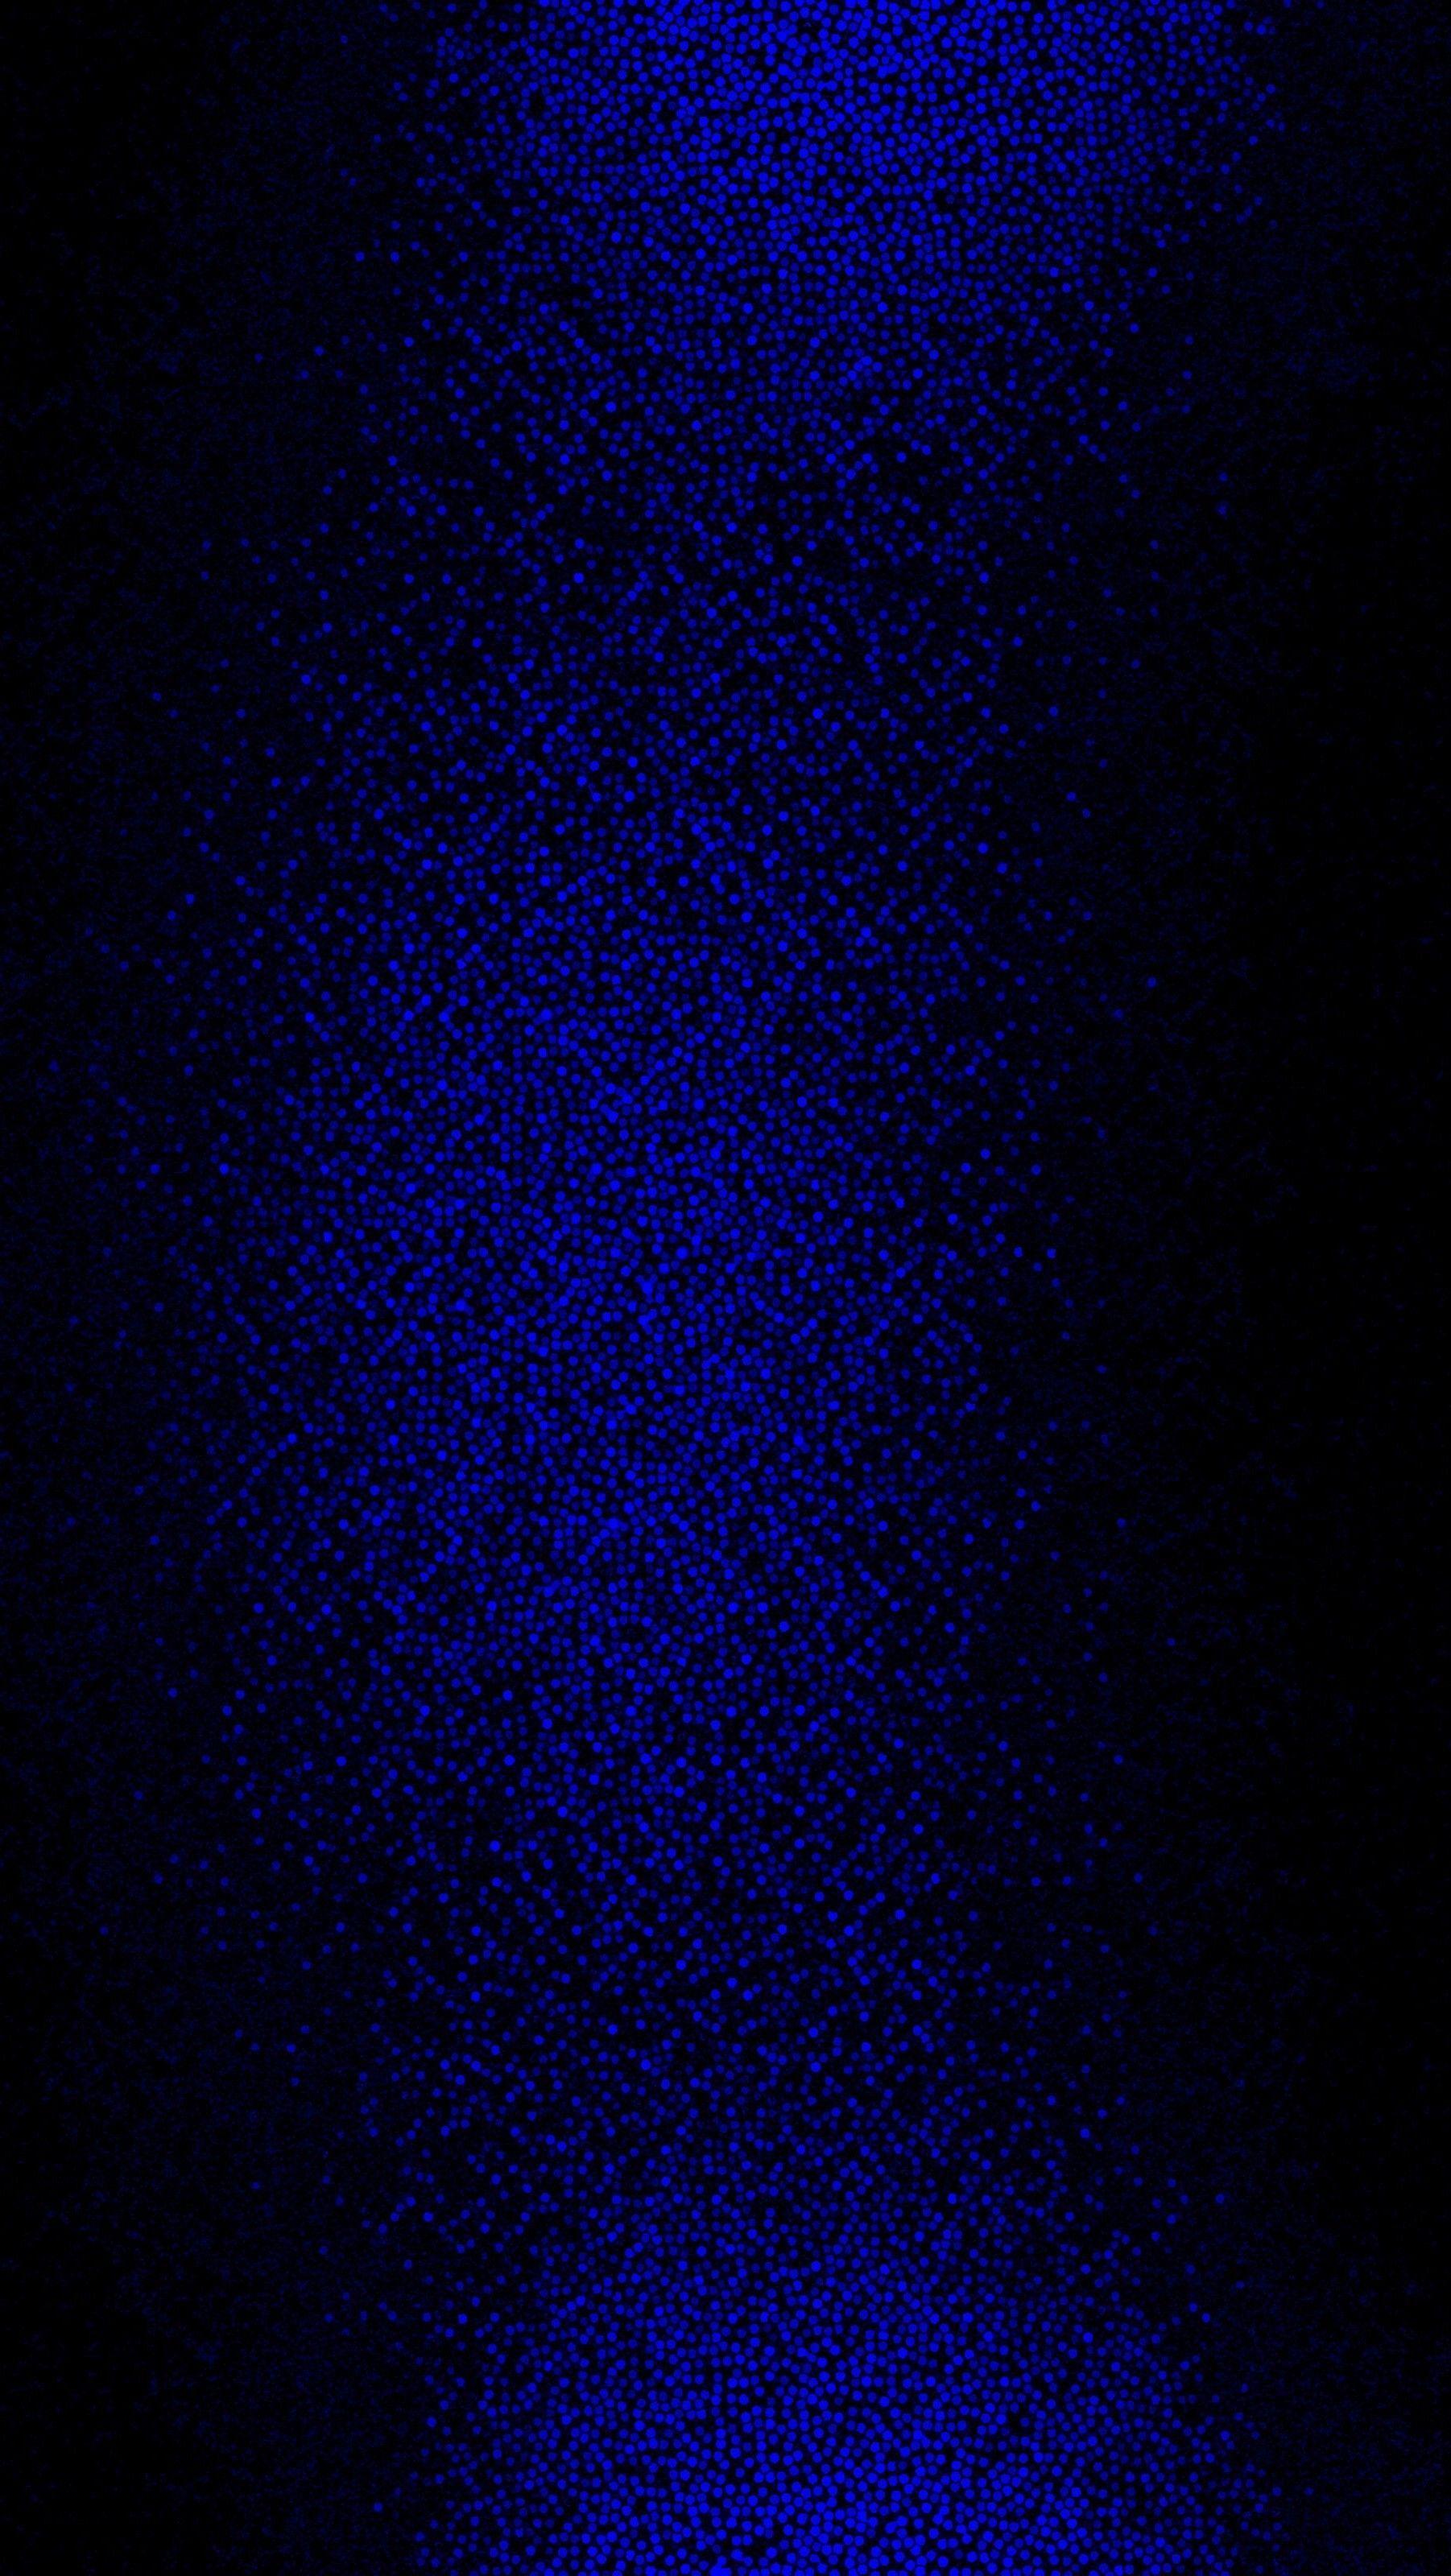 Dark Blue Phone Wallpapers Top Free Dark Blue Phone Backgrounds Wallpaperaccess